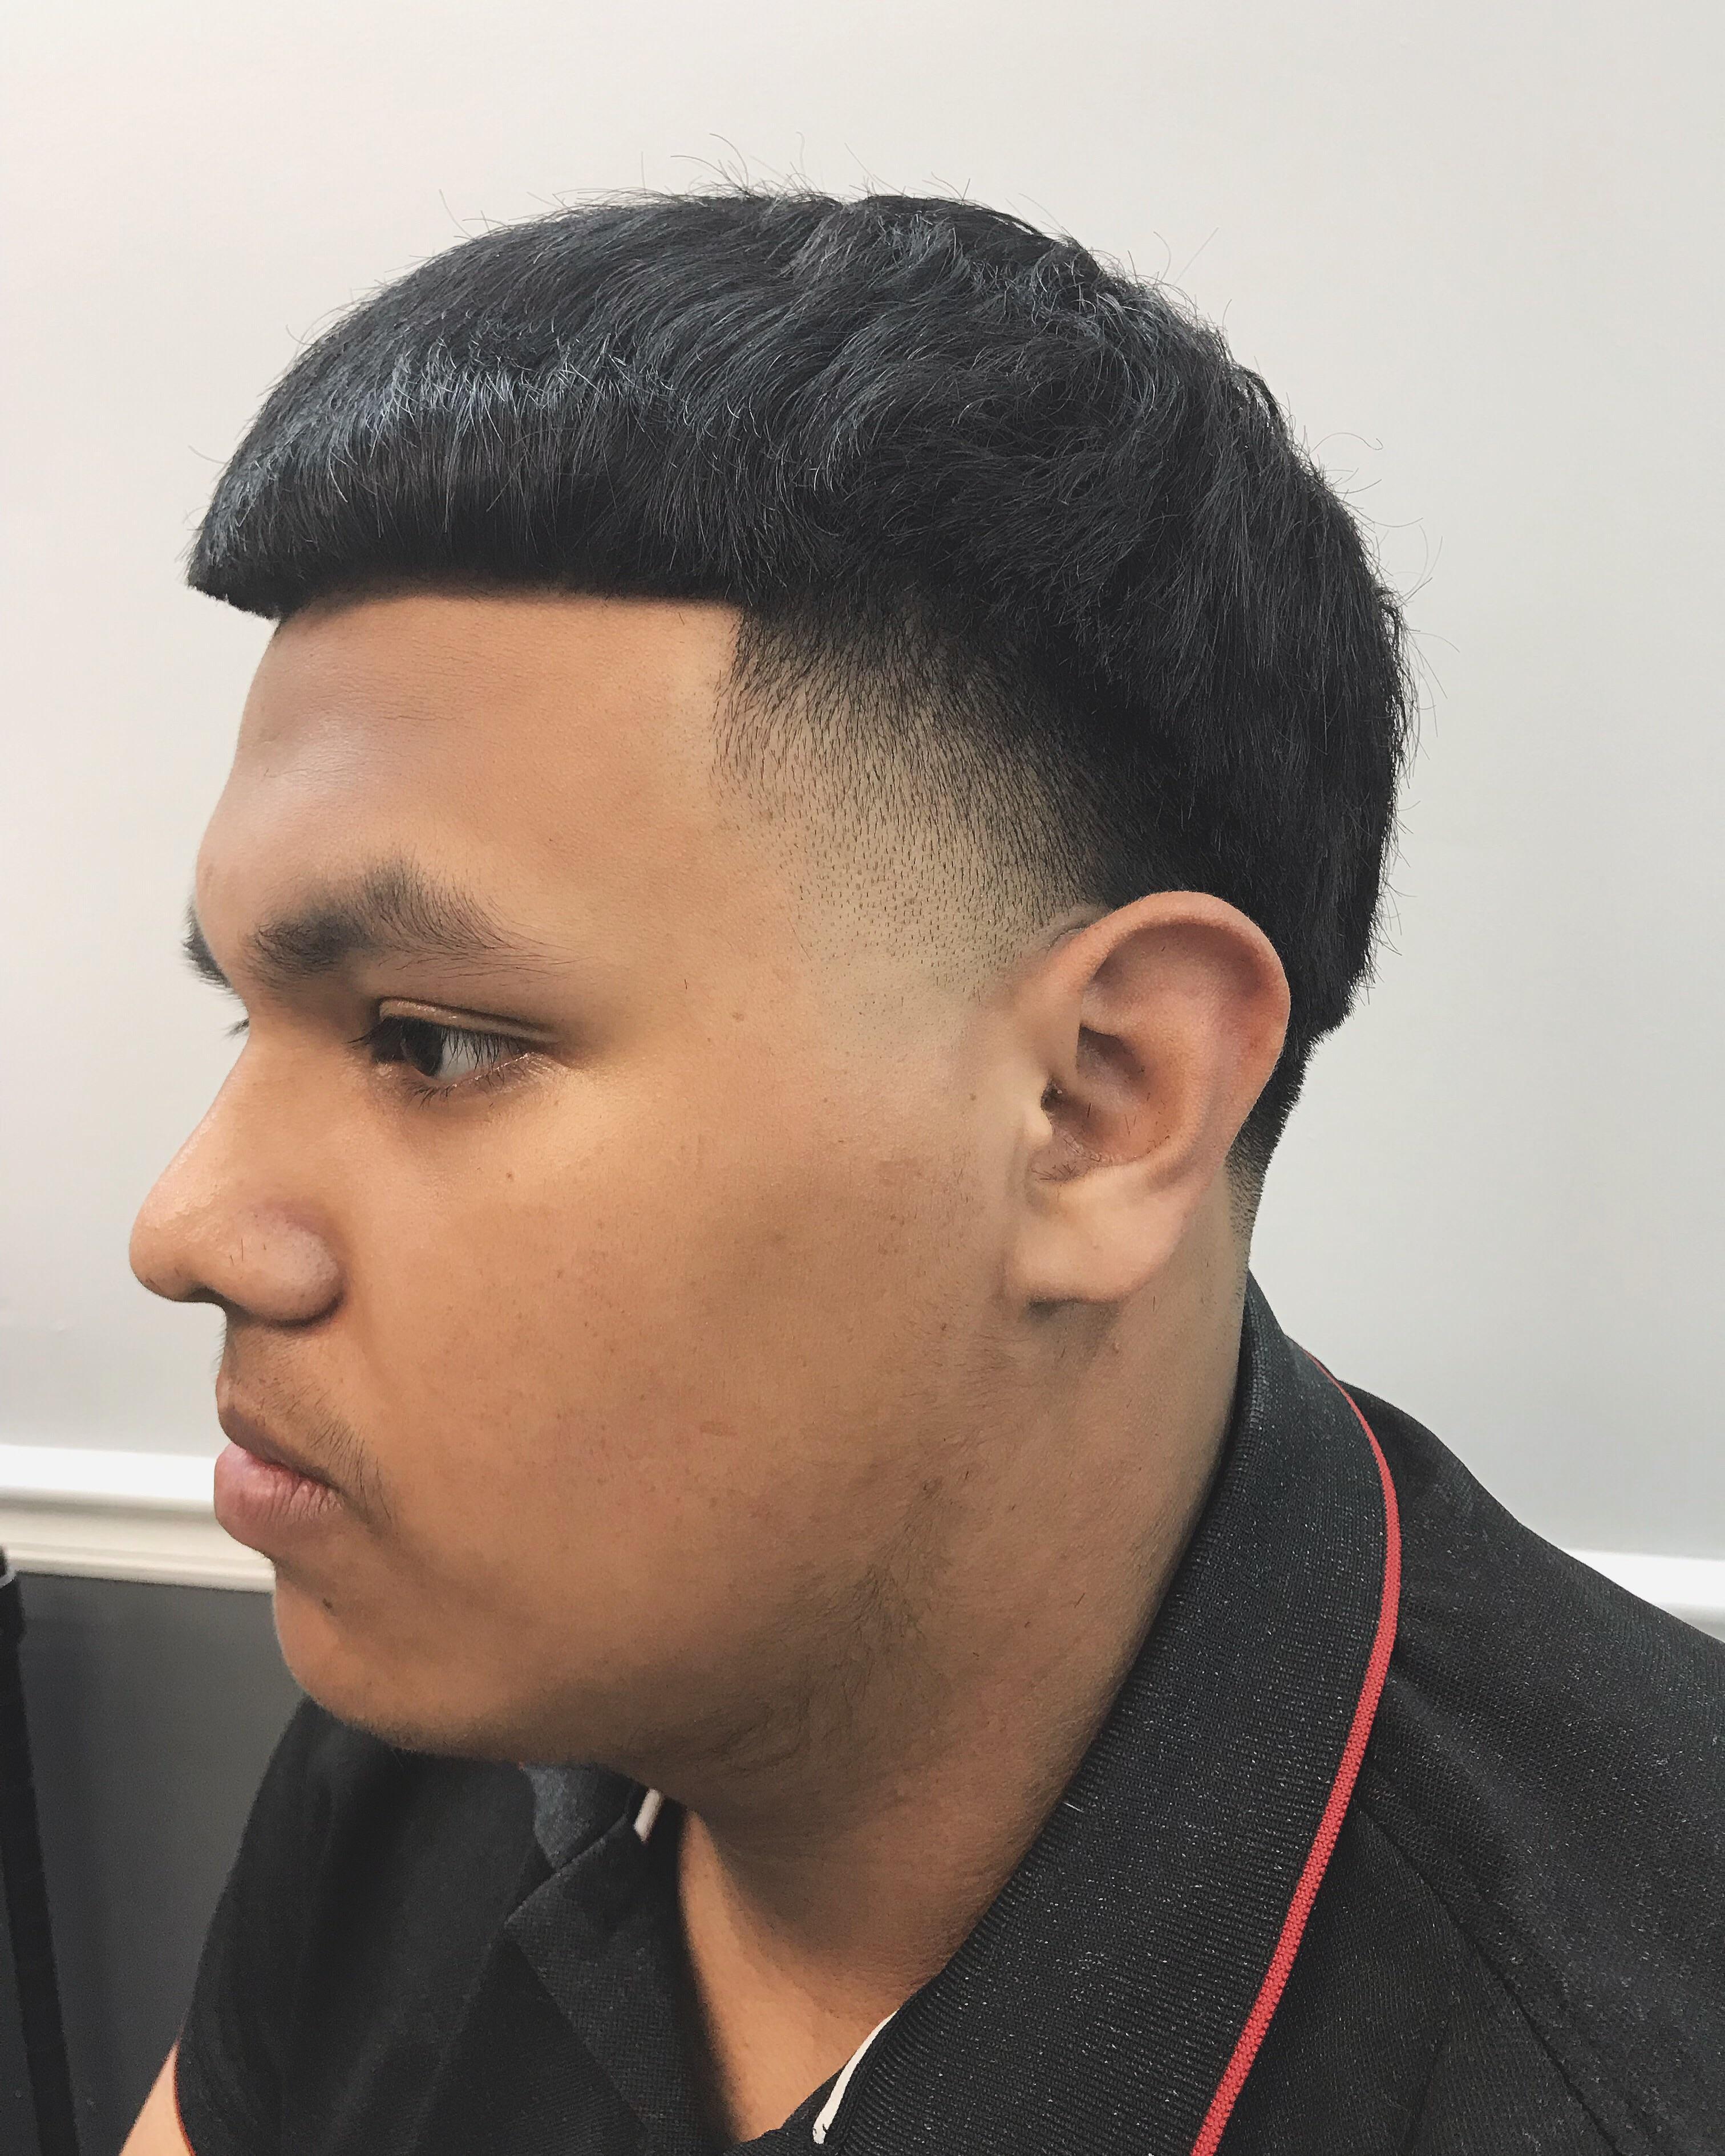 Anuel Aa Haircut Name : anuel, haircut, Anuel, Haircut, Bpatello